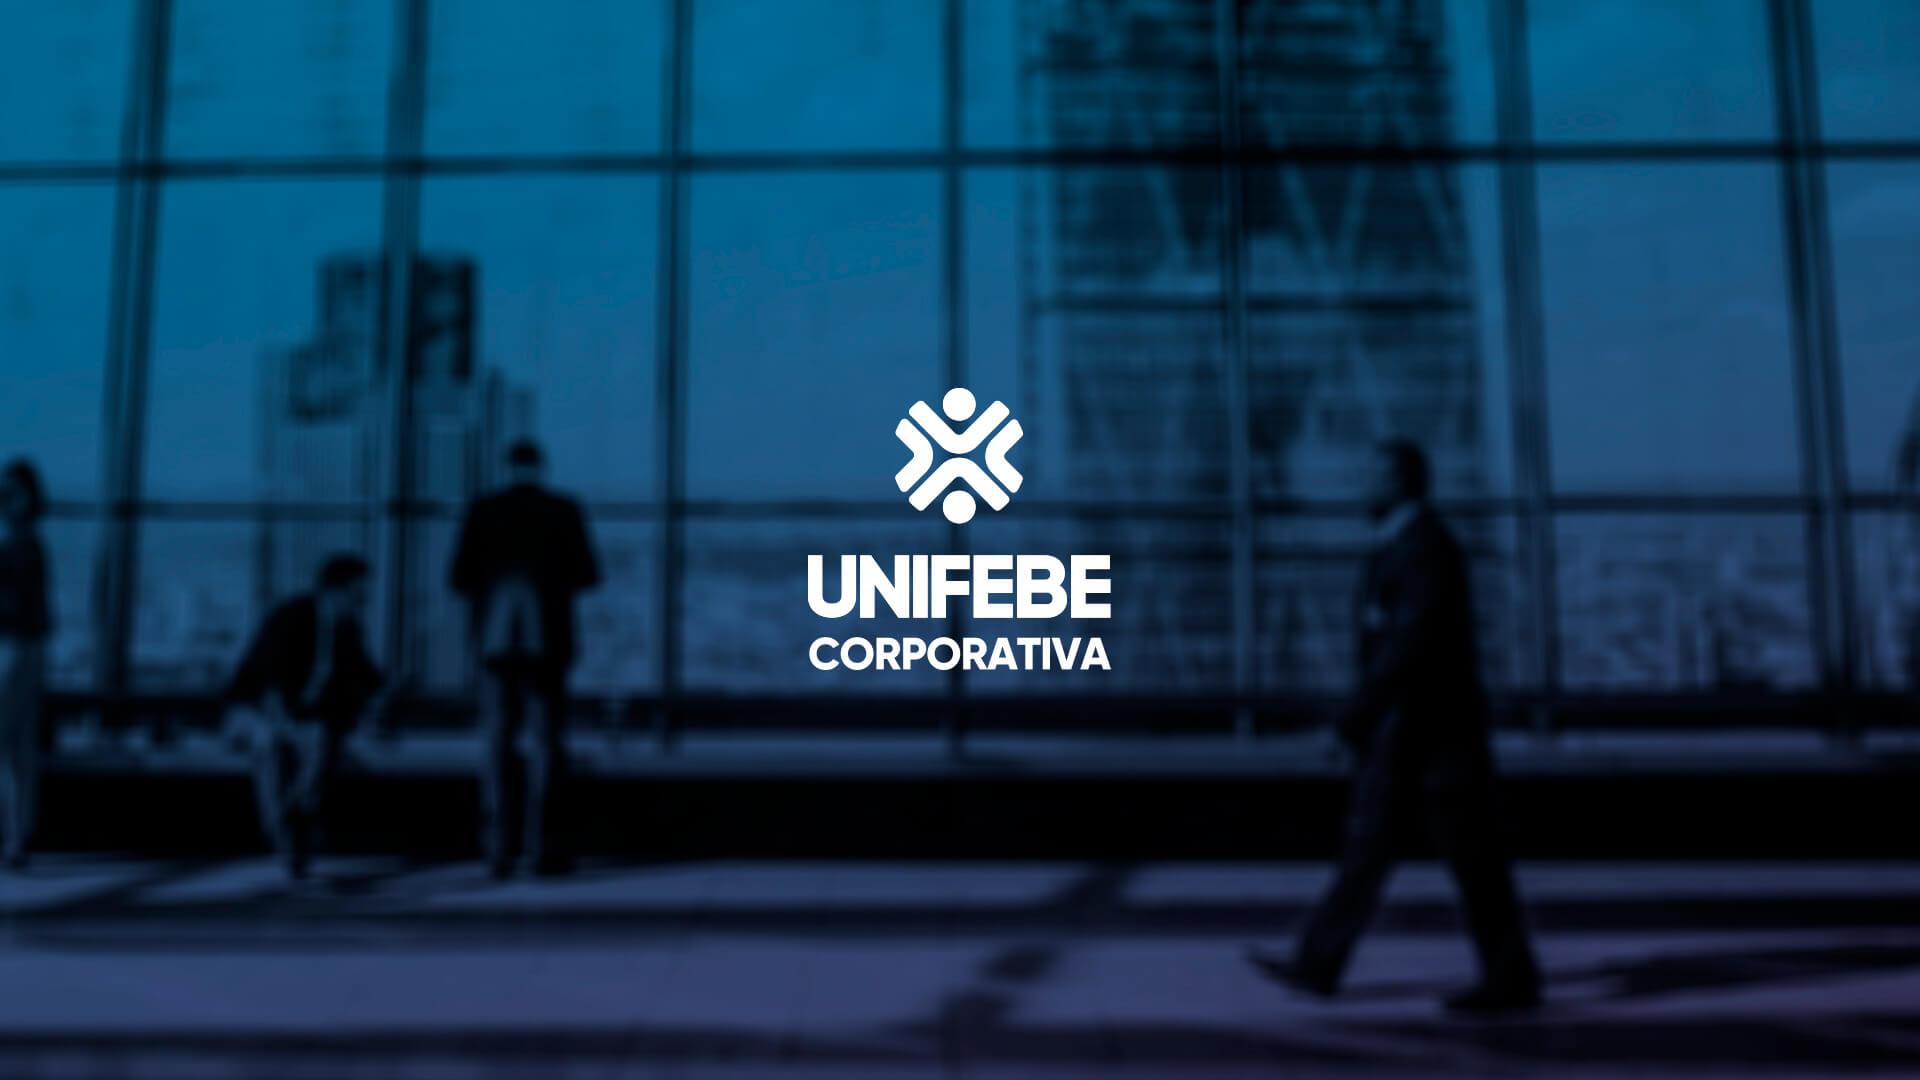 Banner-Home-UNIFEBE-Corporativa